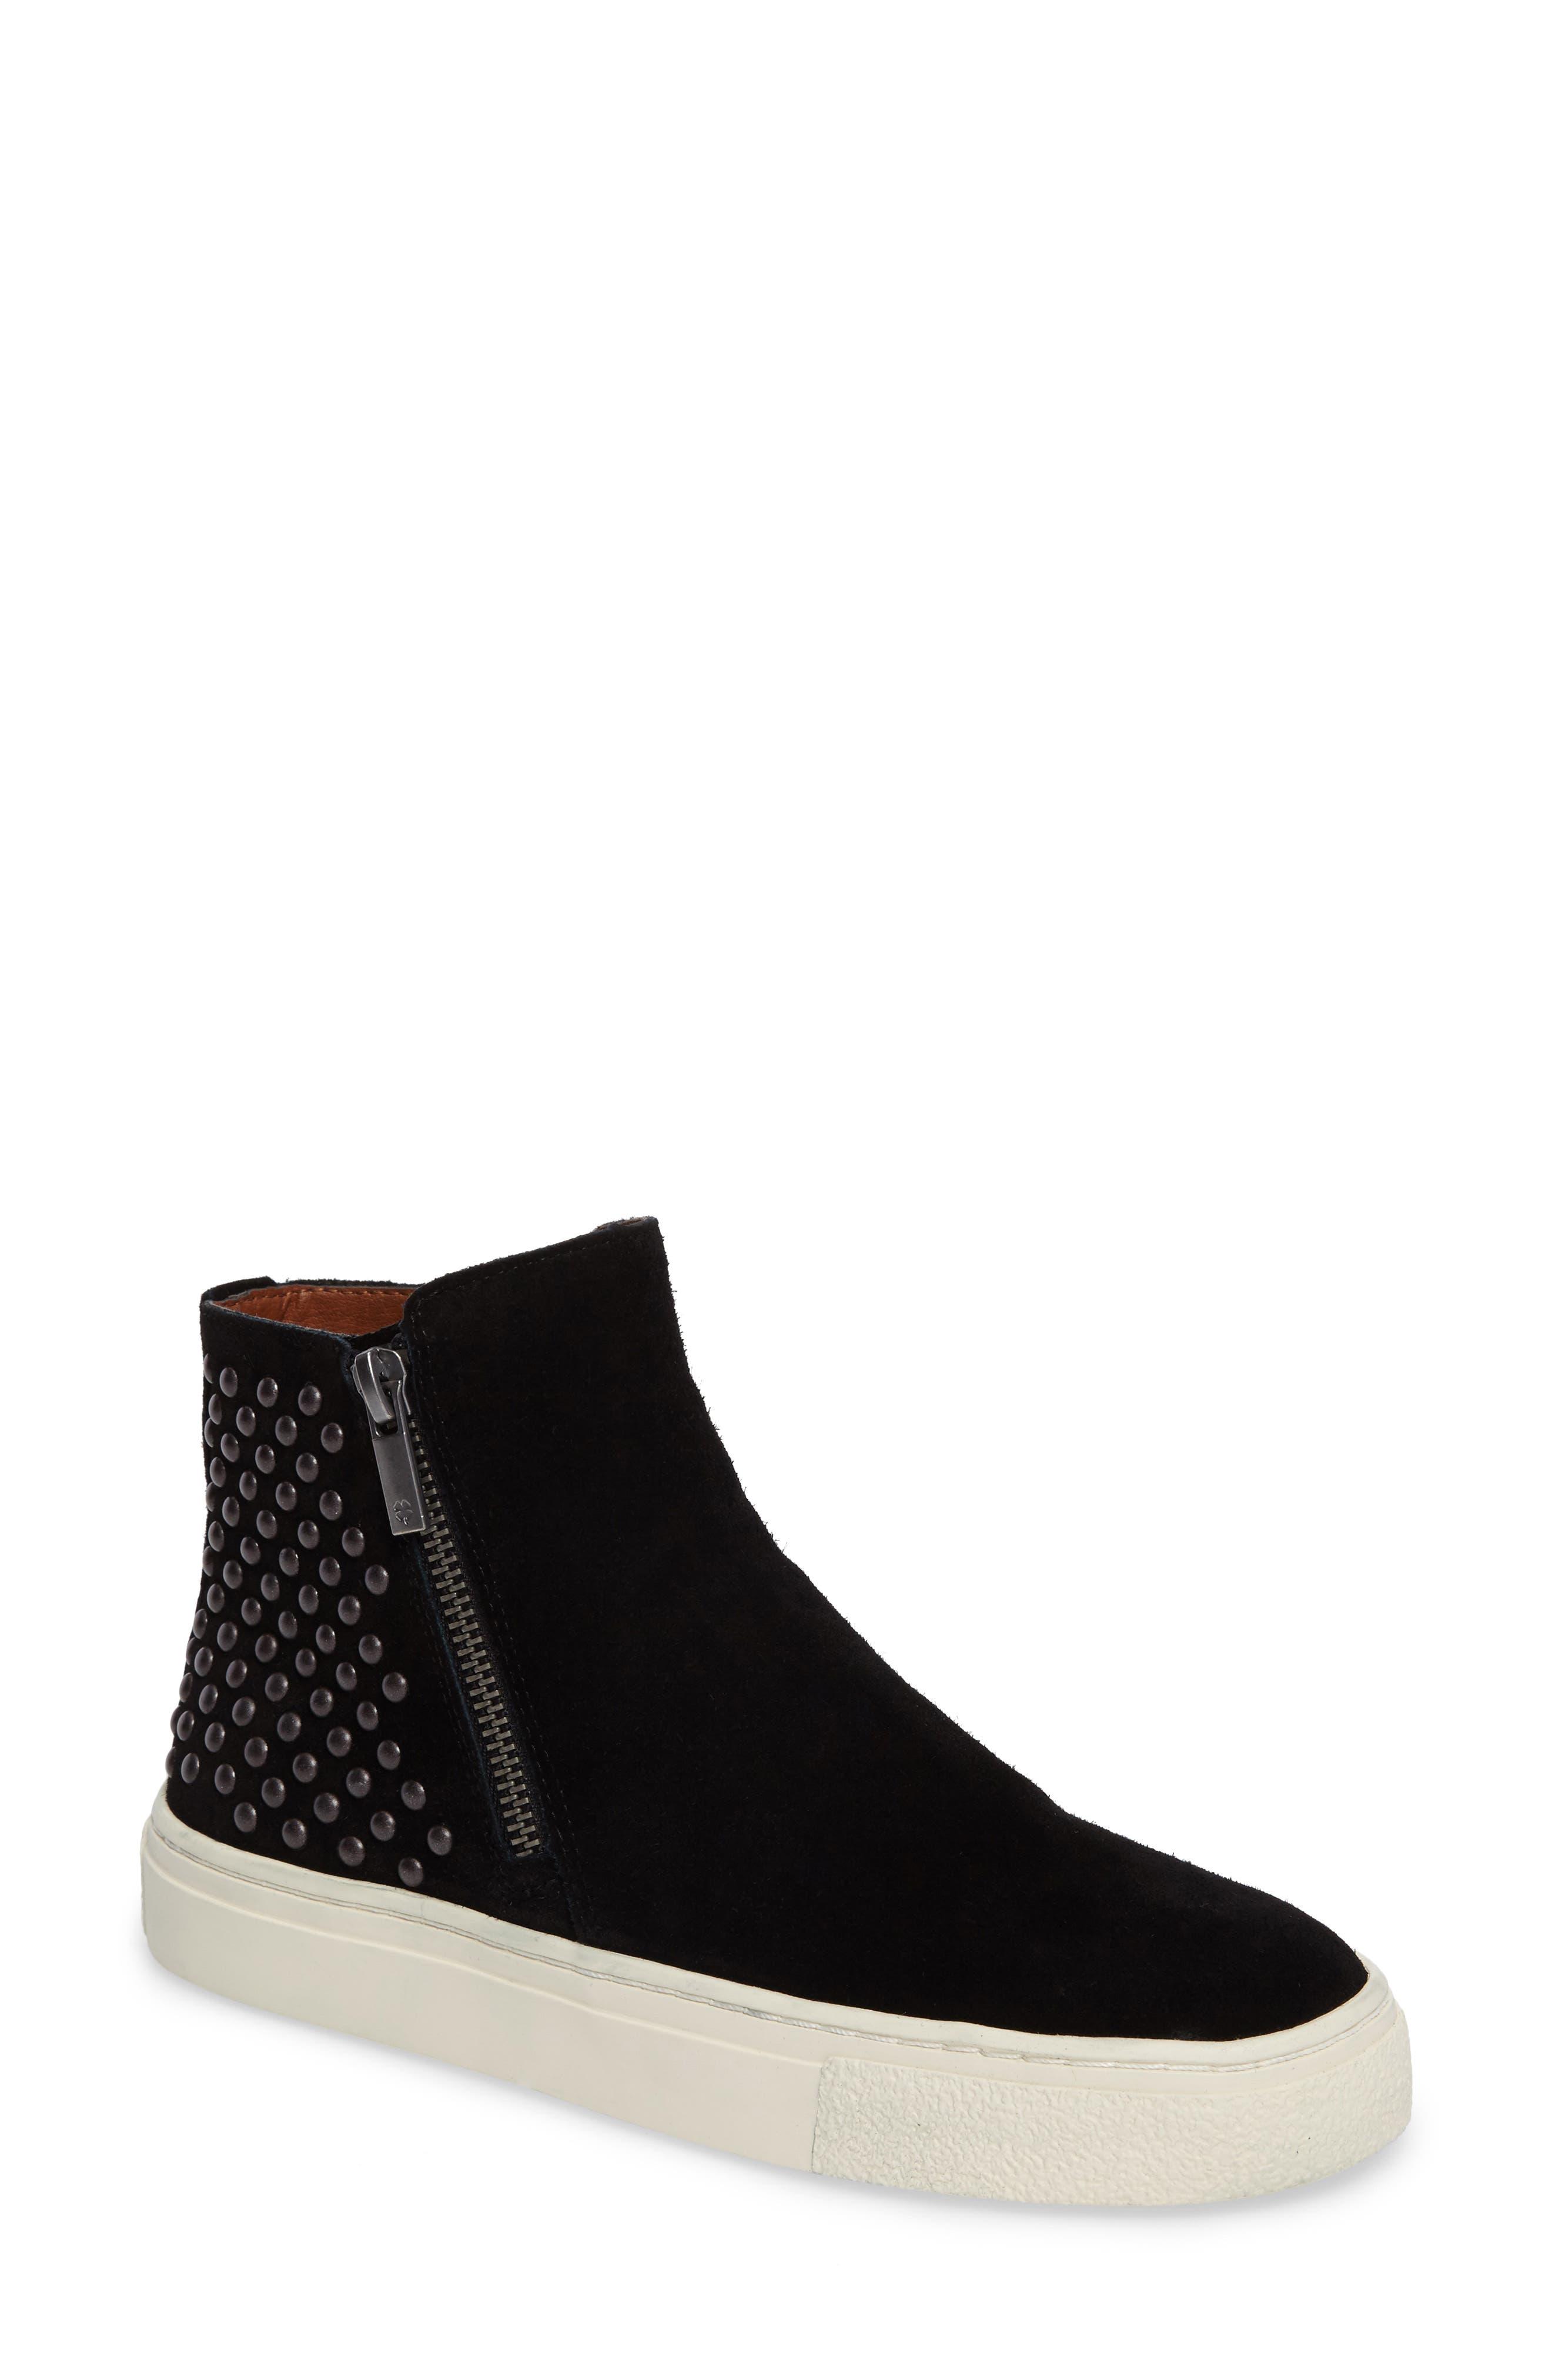 Bayleah High Top Sneaker,                             Main thumbnail 1, color,                             Black Suede